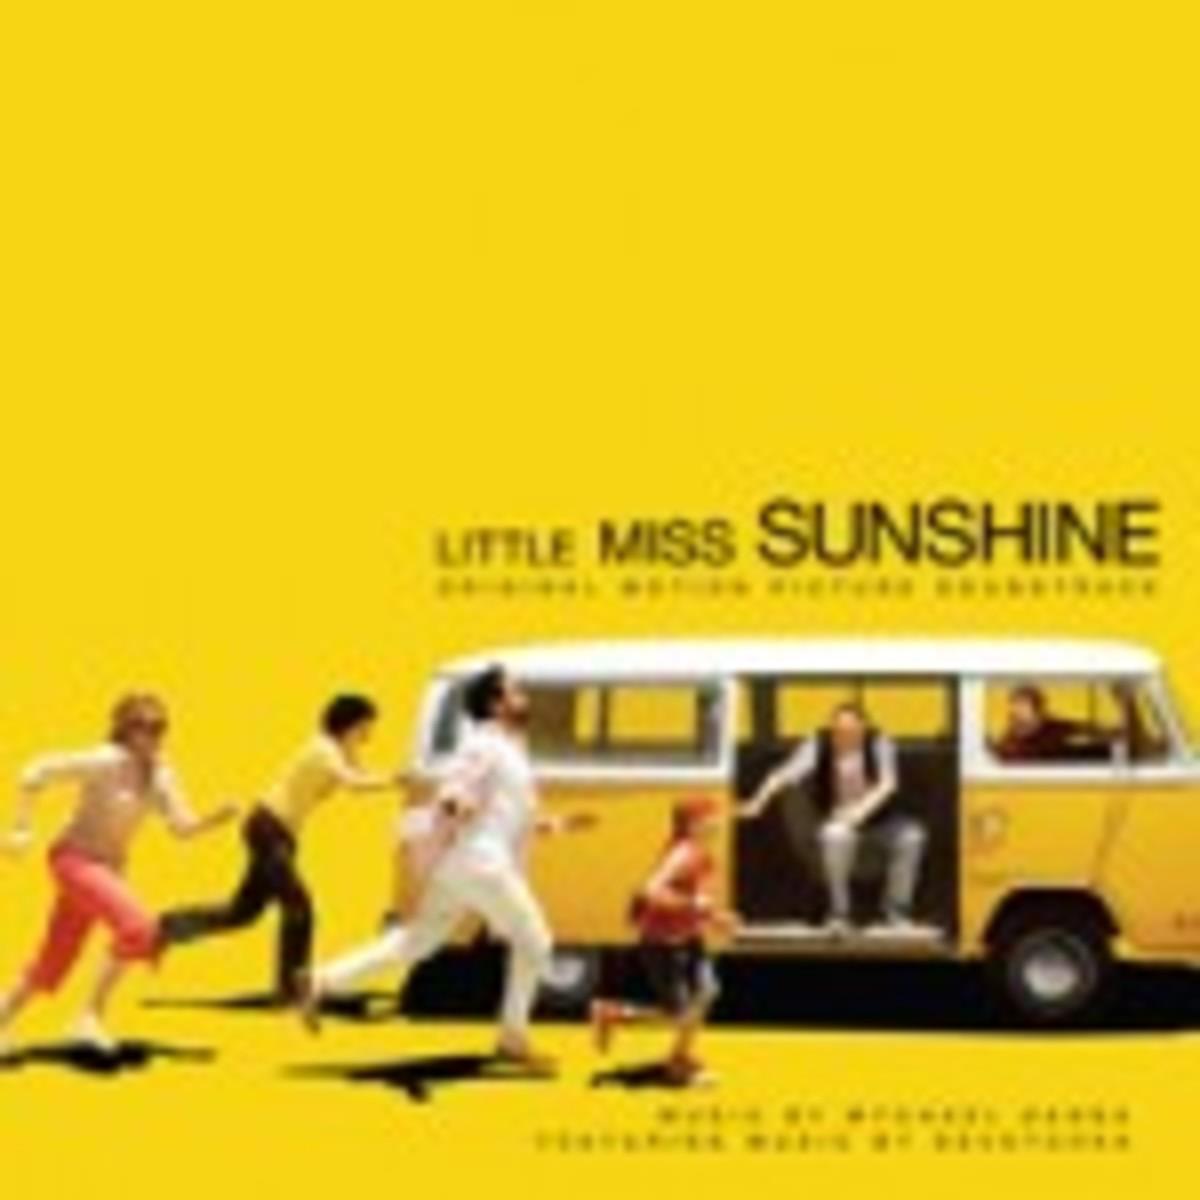 Little Miss Sunshine soundtrack on vinyl